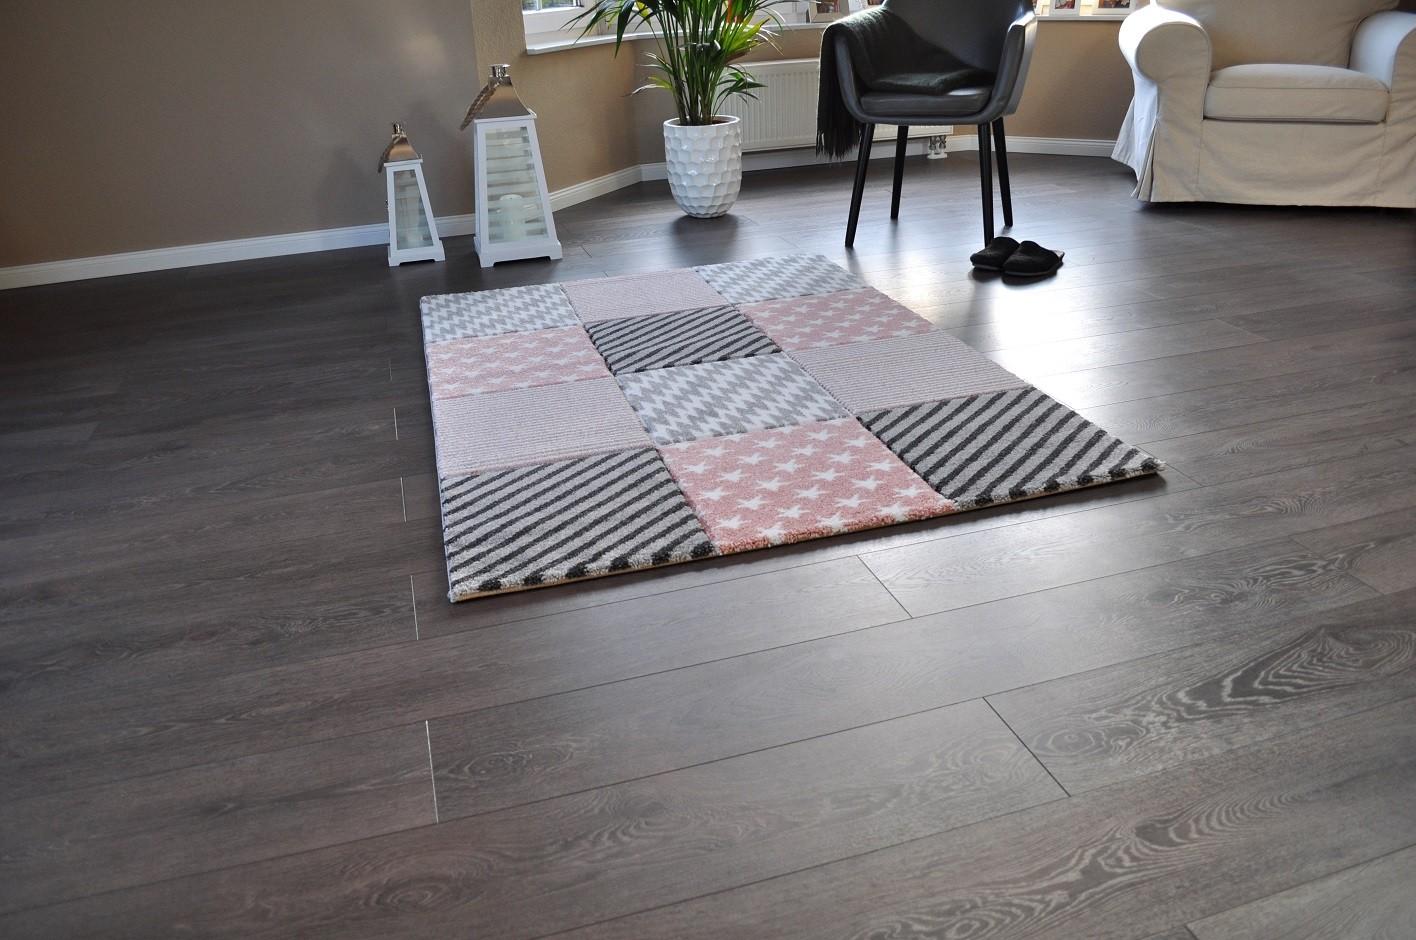 teppich mit sternen grau teppich mit sternen grau weiss. Black Bedroom Furniture Sets. Home Design Ideas